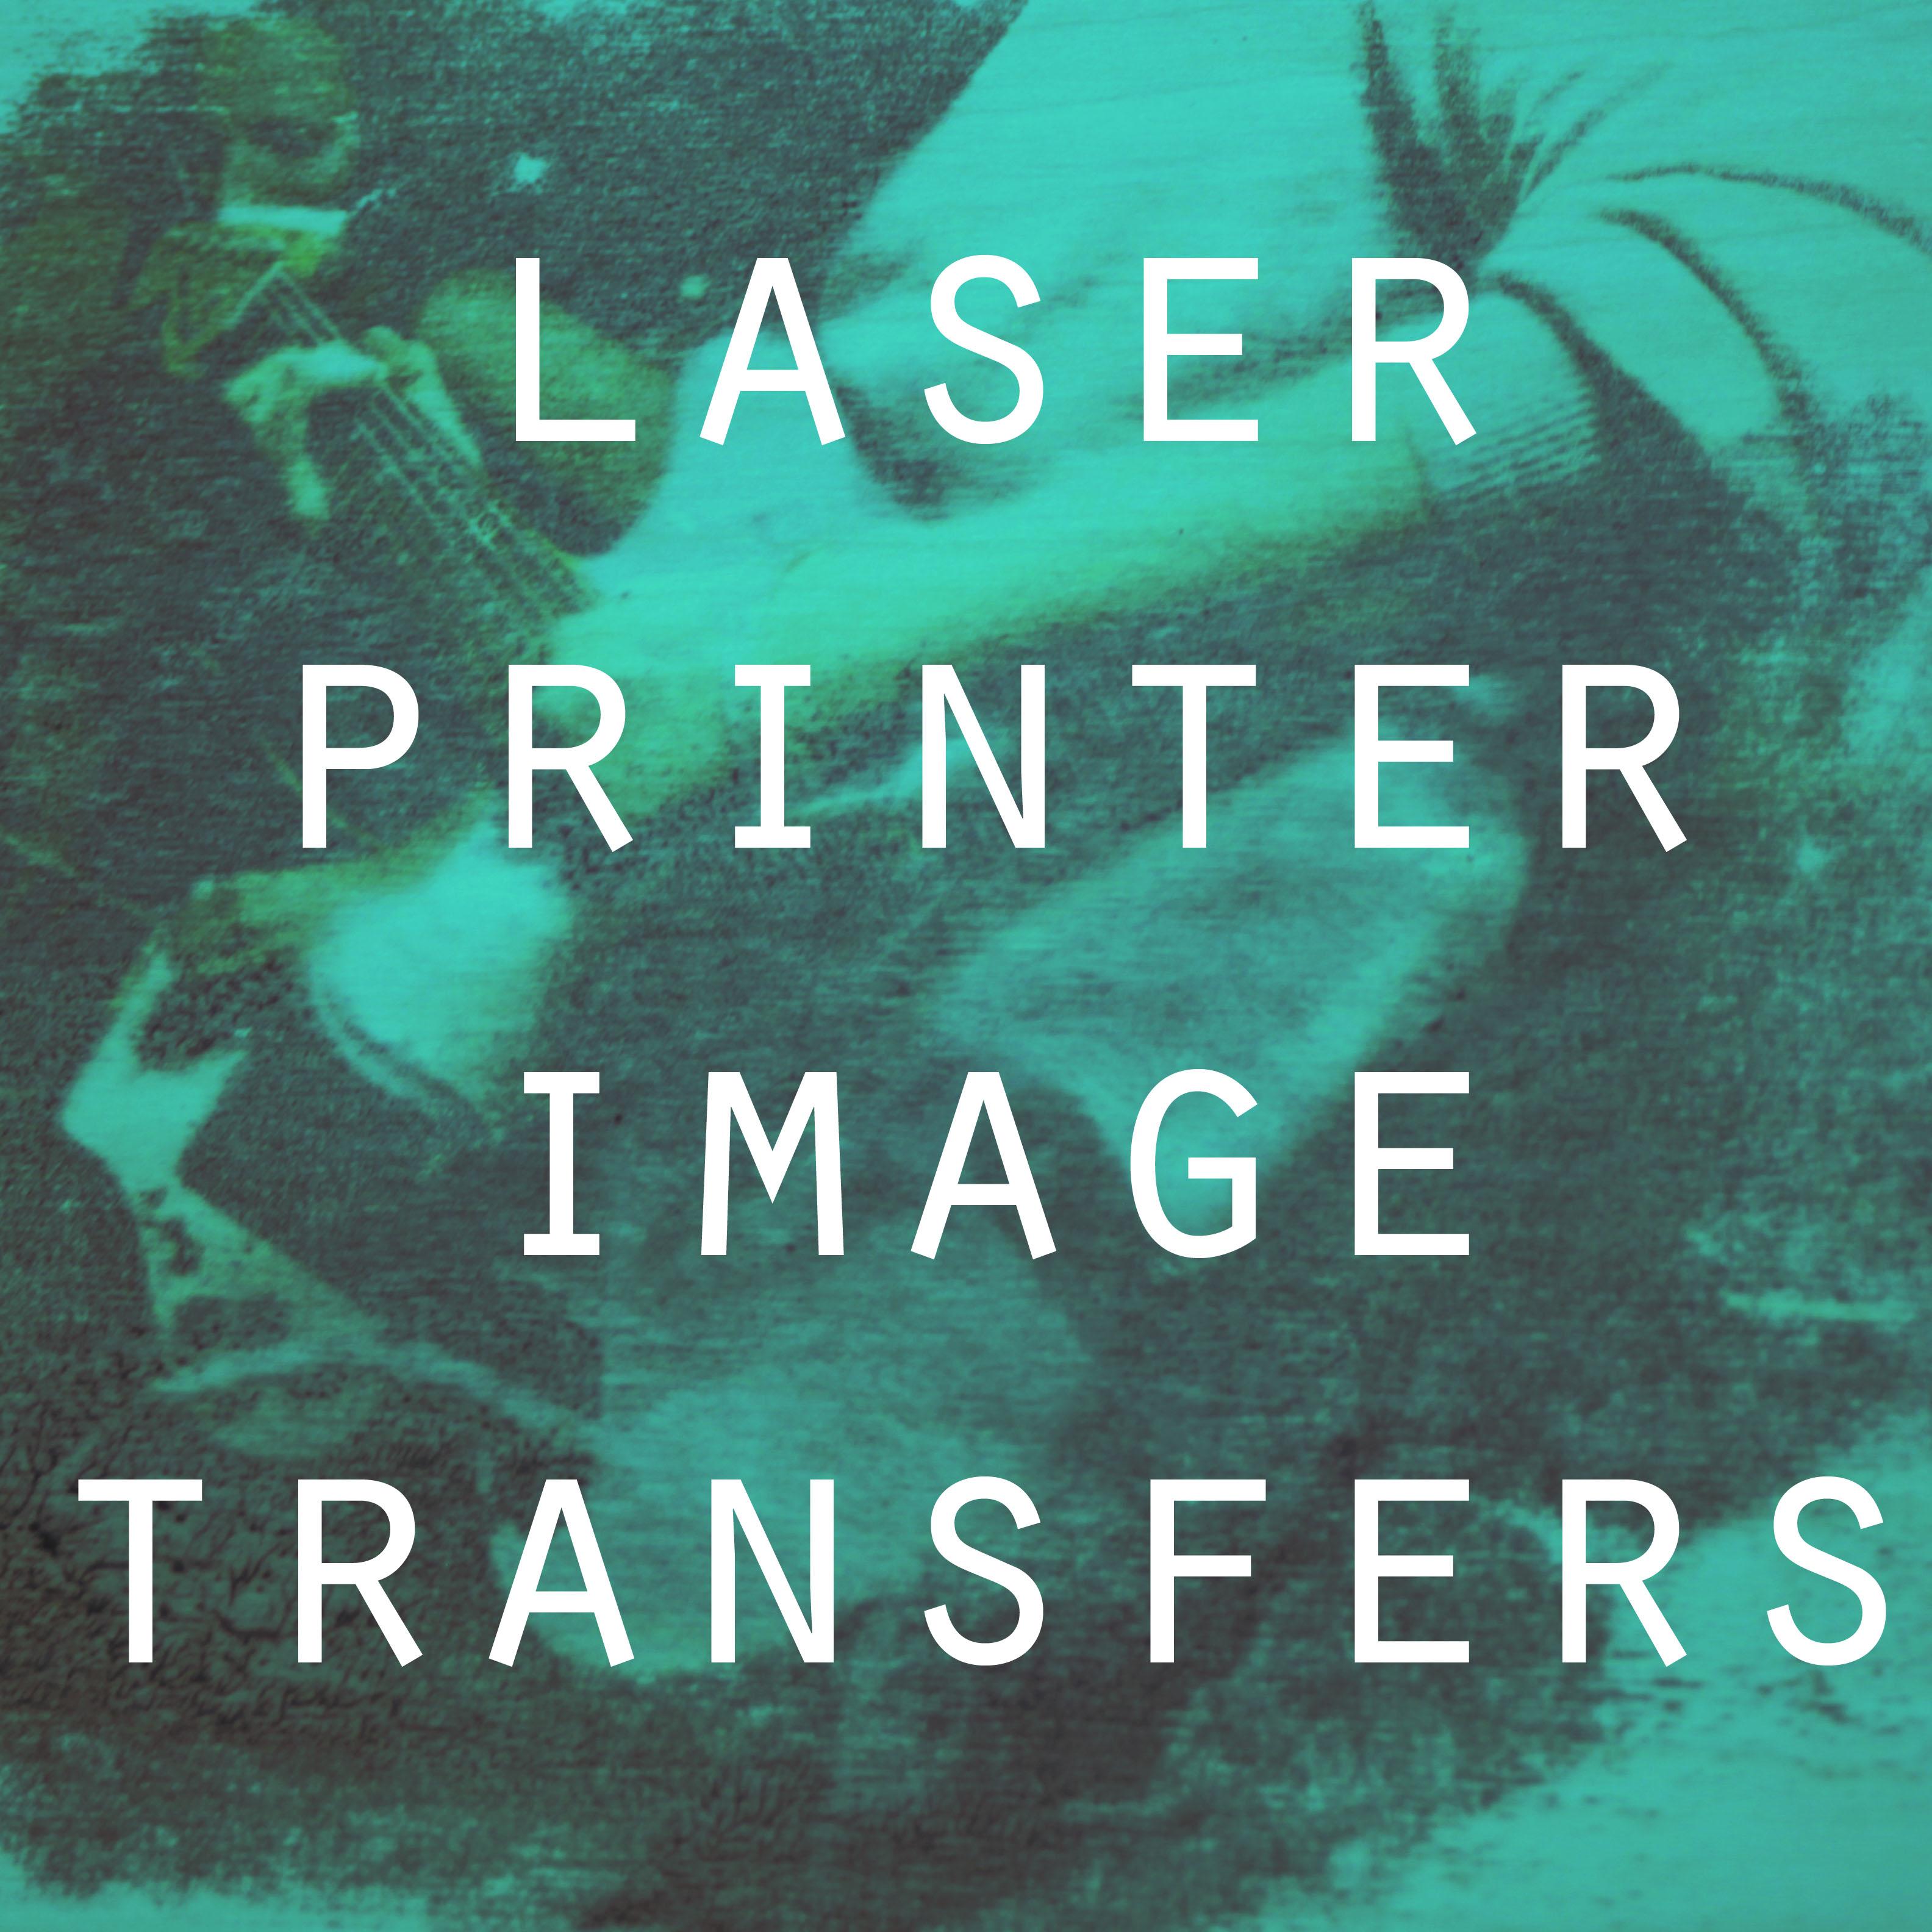 Laser Printer Image Transfers